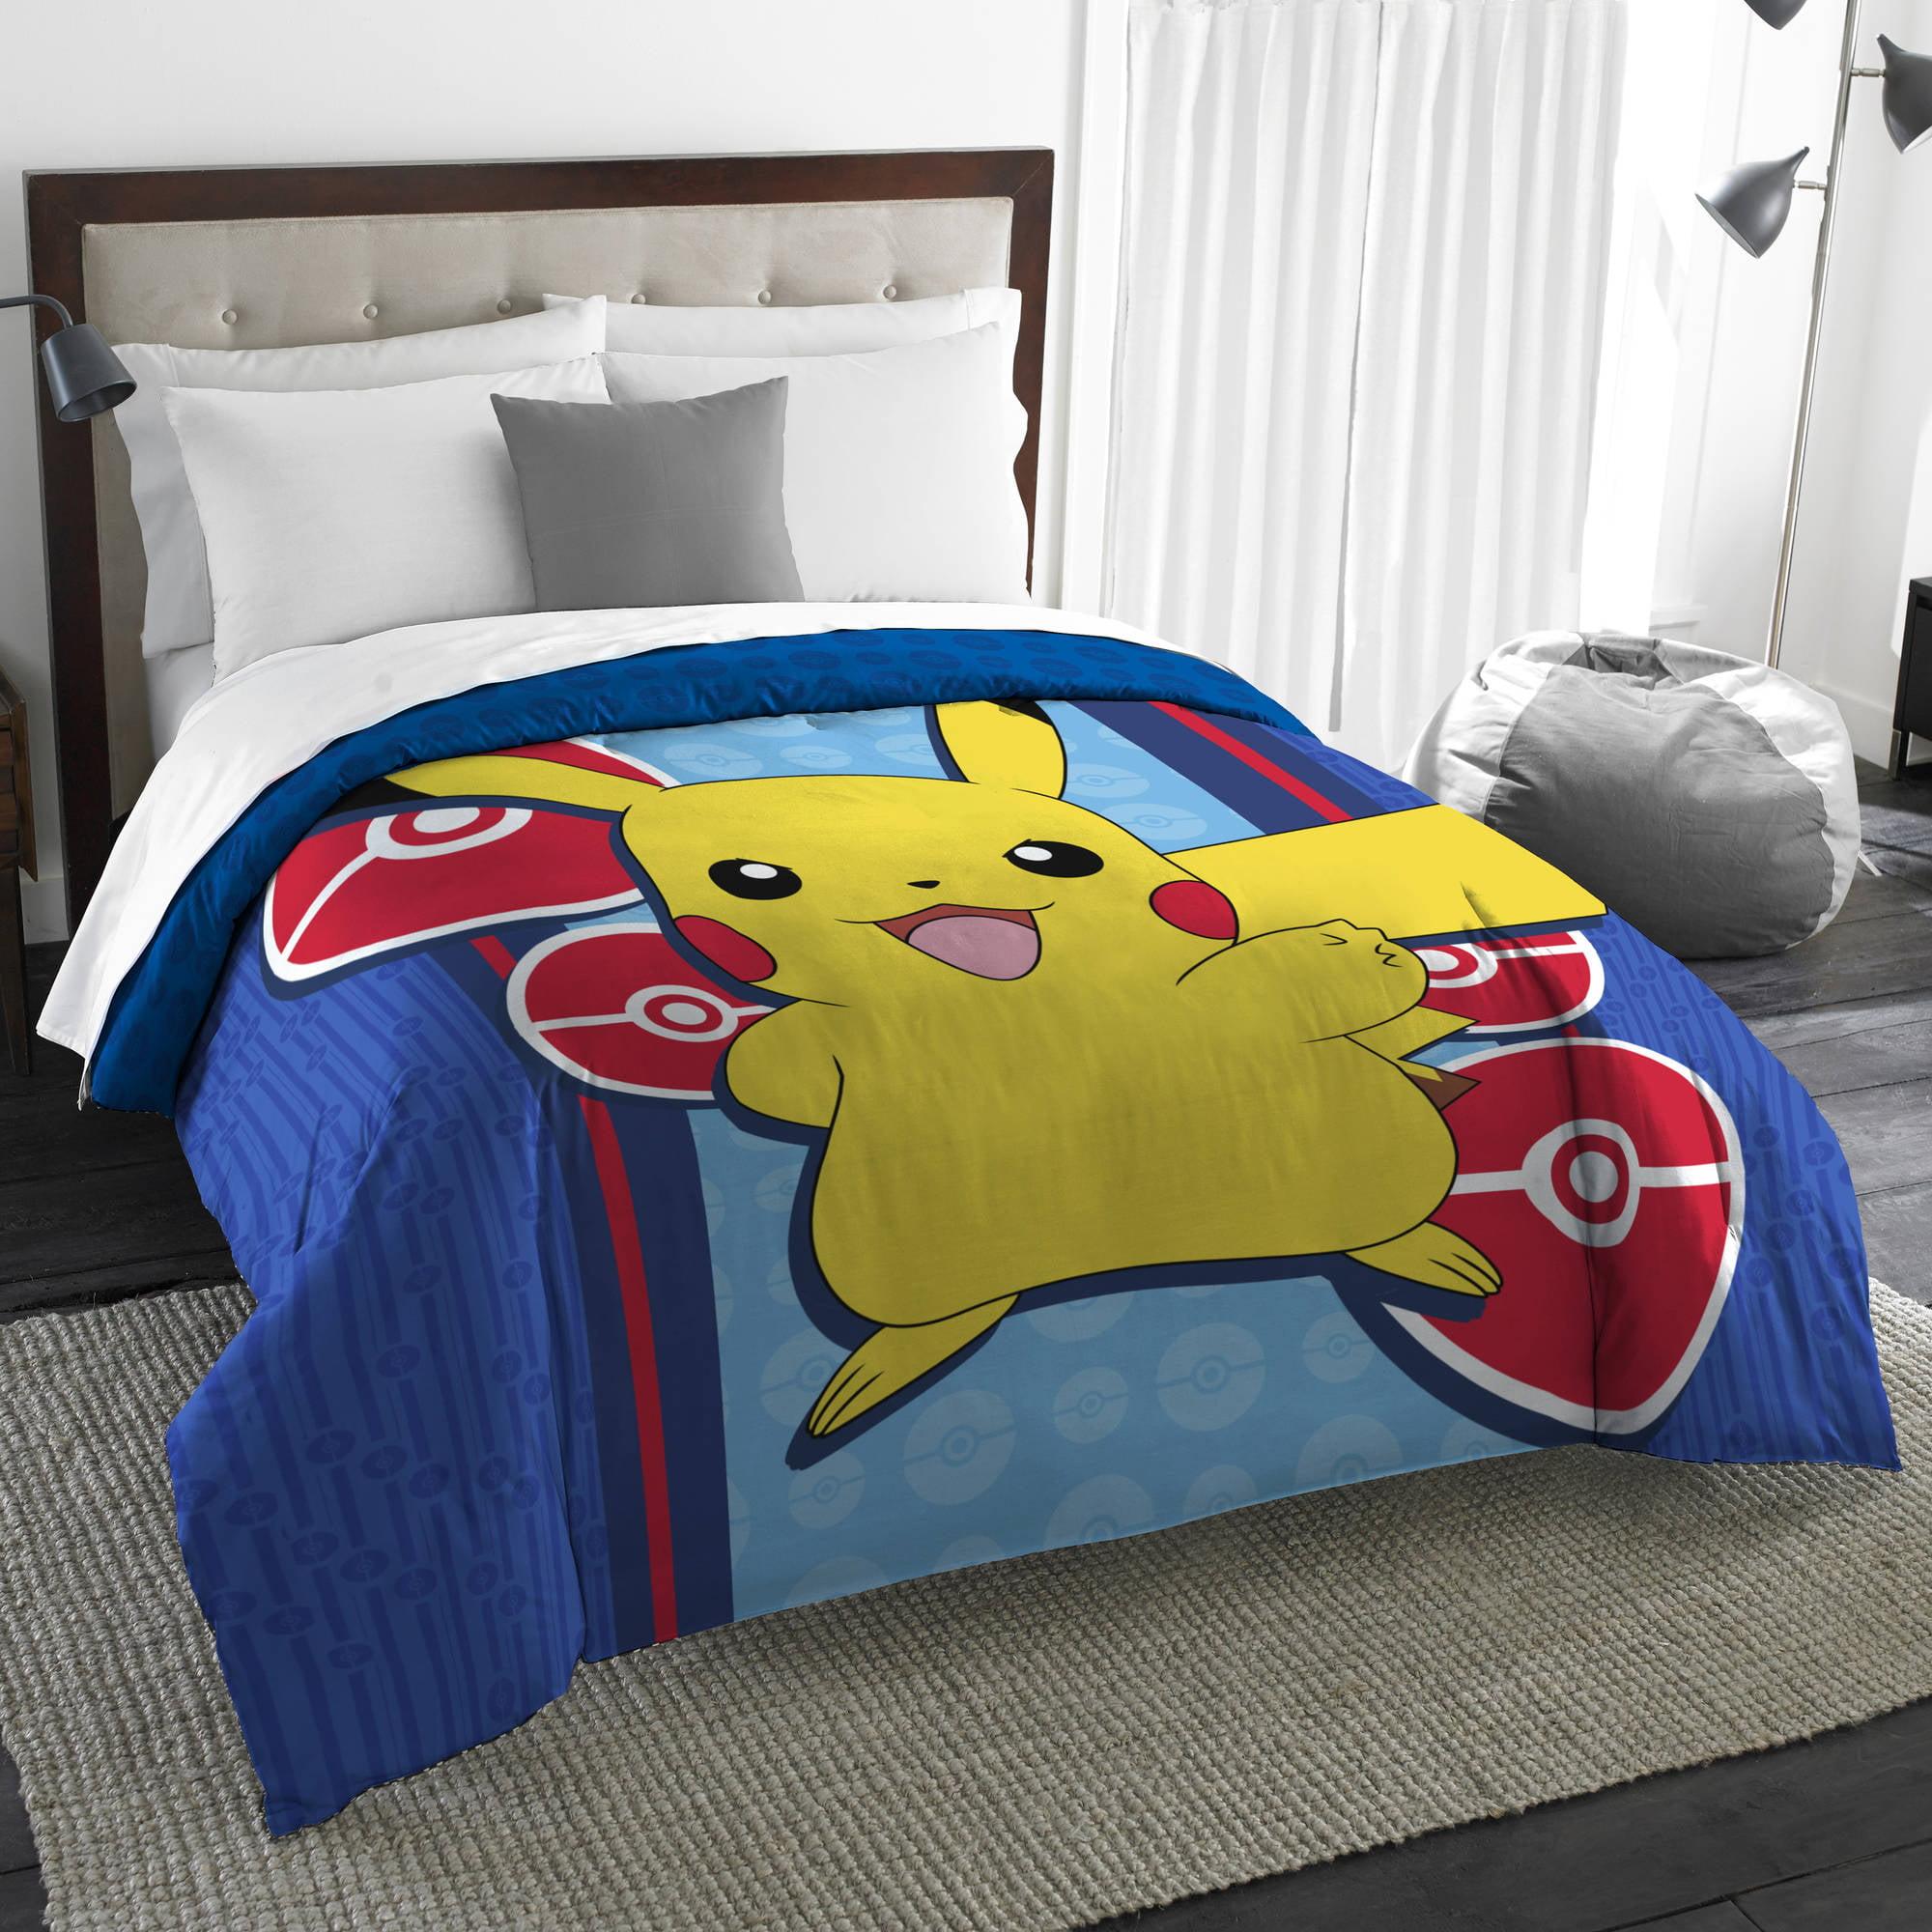 Pokemon Bedroom Accessories